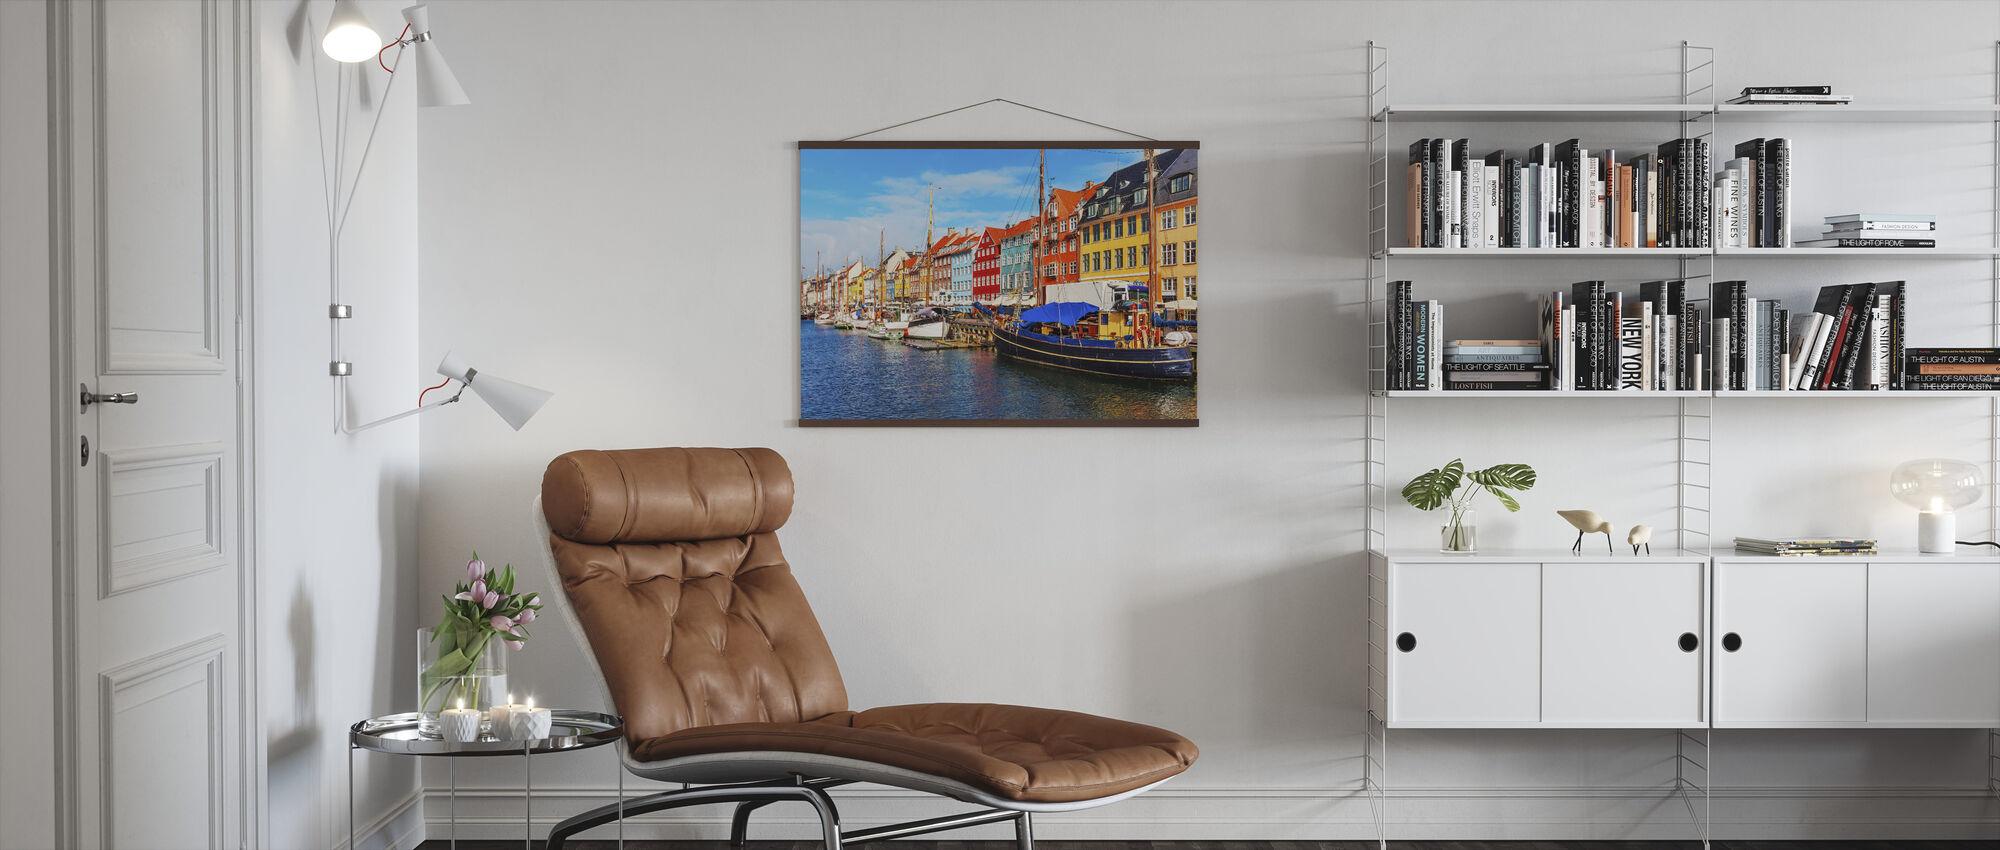 Zomerzicht op Nyhavn Pier - Poster - Woonkamer